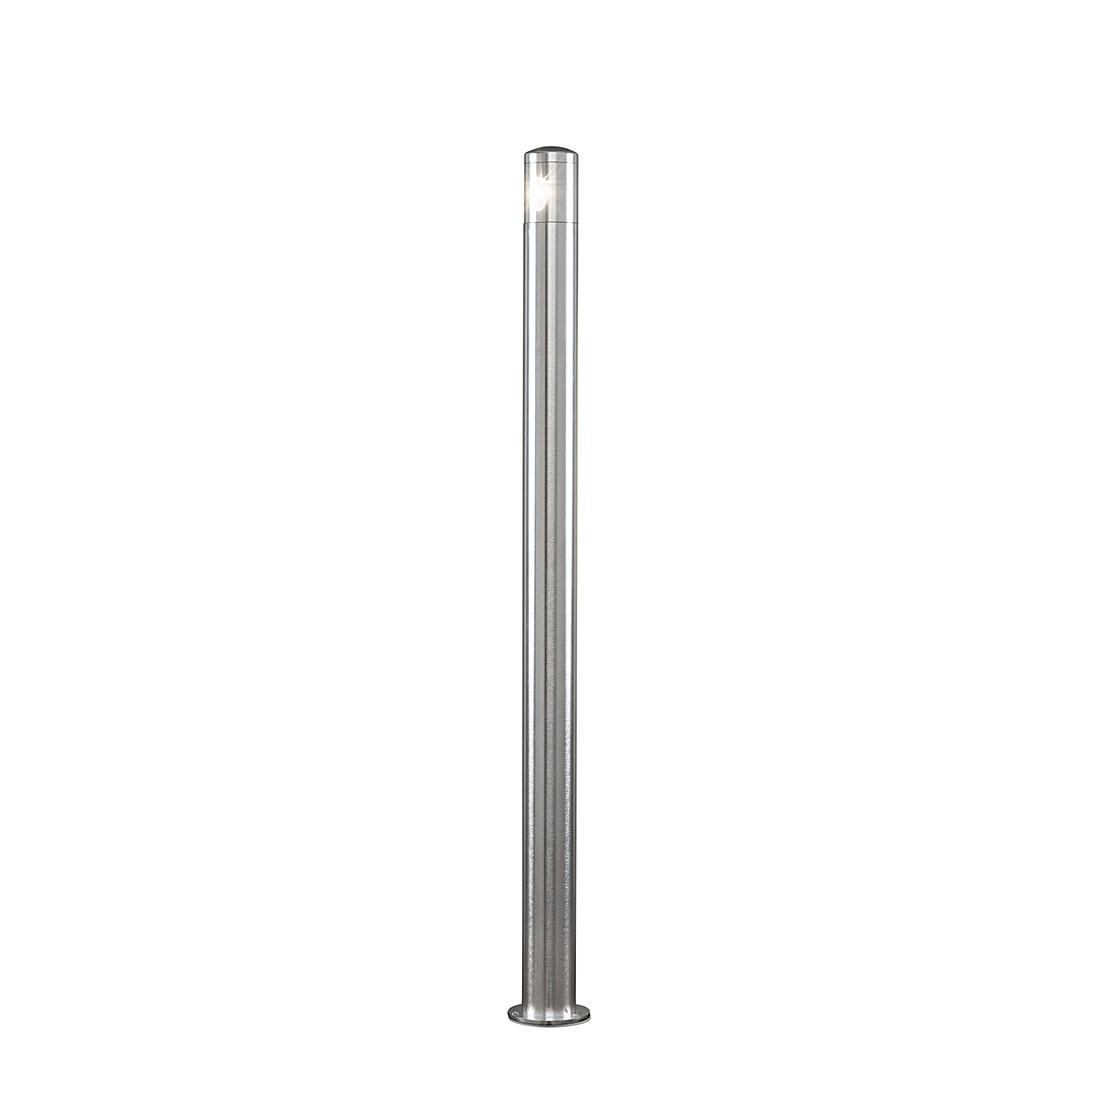 EEK A+, LED Wegeleuchte Monza II - Aluminium - 2-flammig, Konstsmide